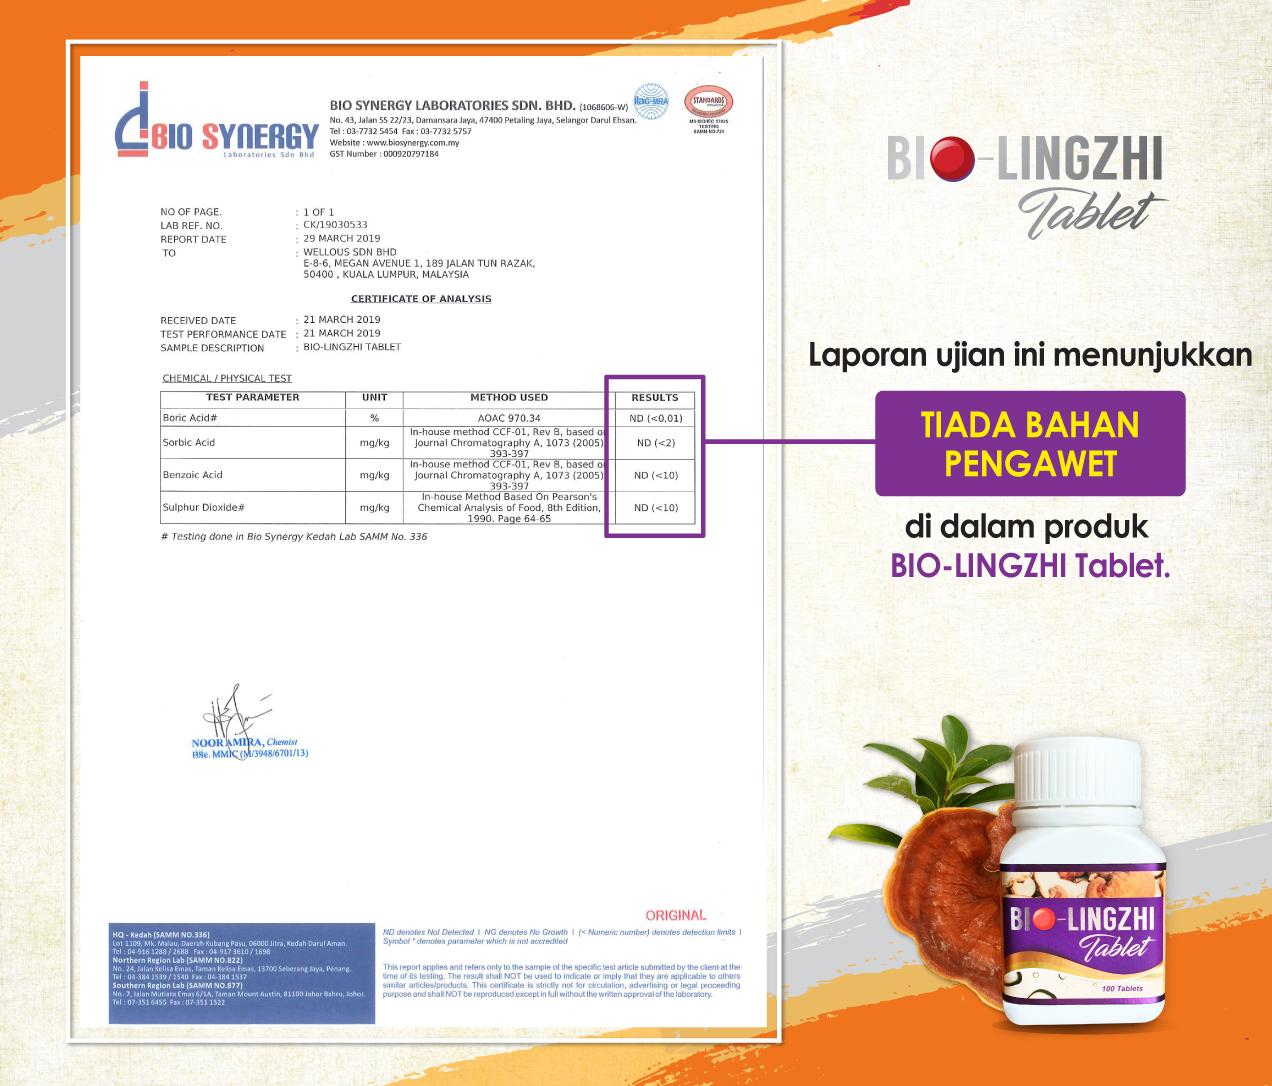 Bio-LingZhi_BioSynergy-Preservative-certificate_BM